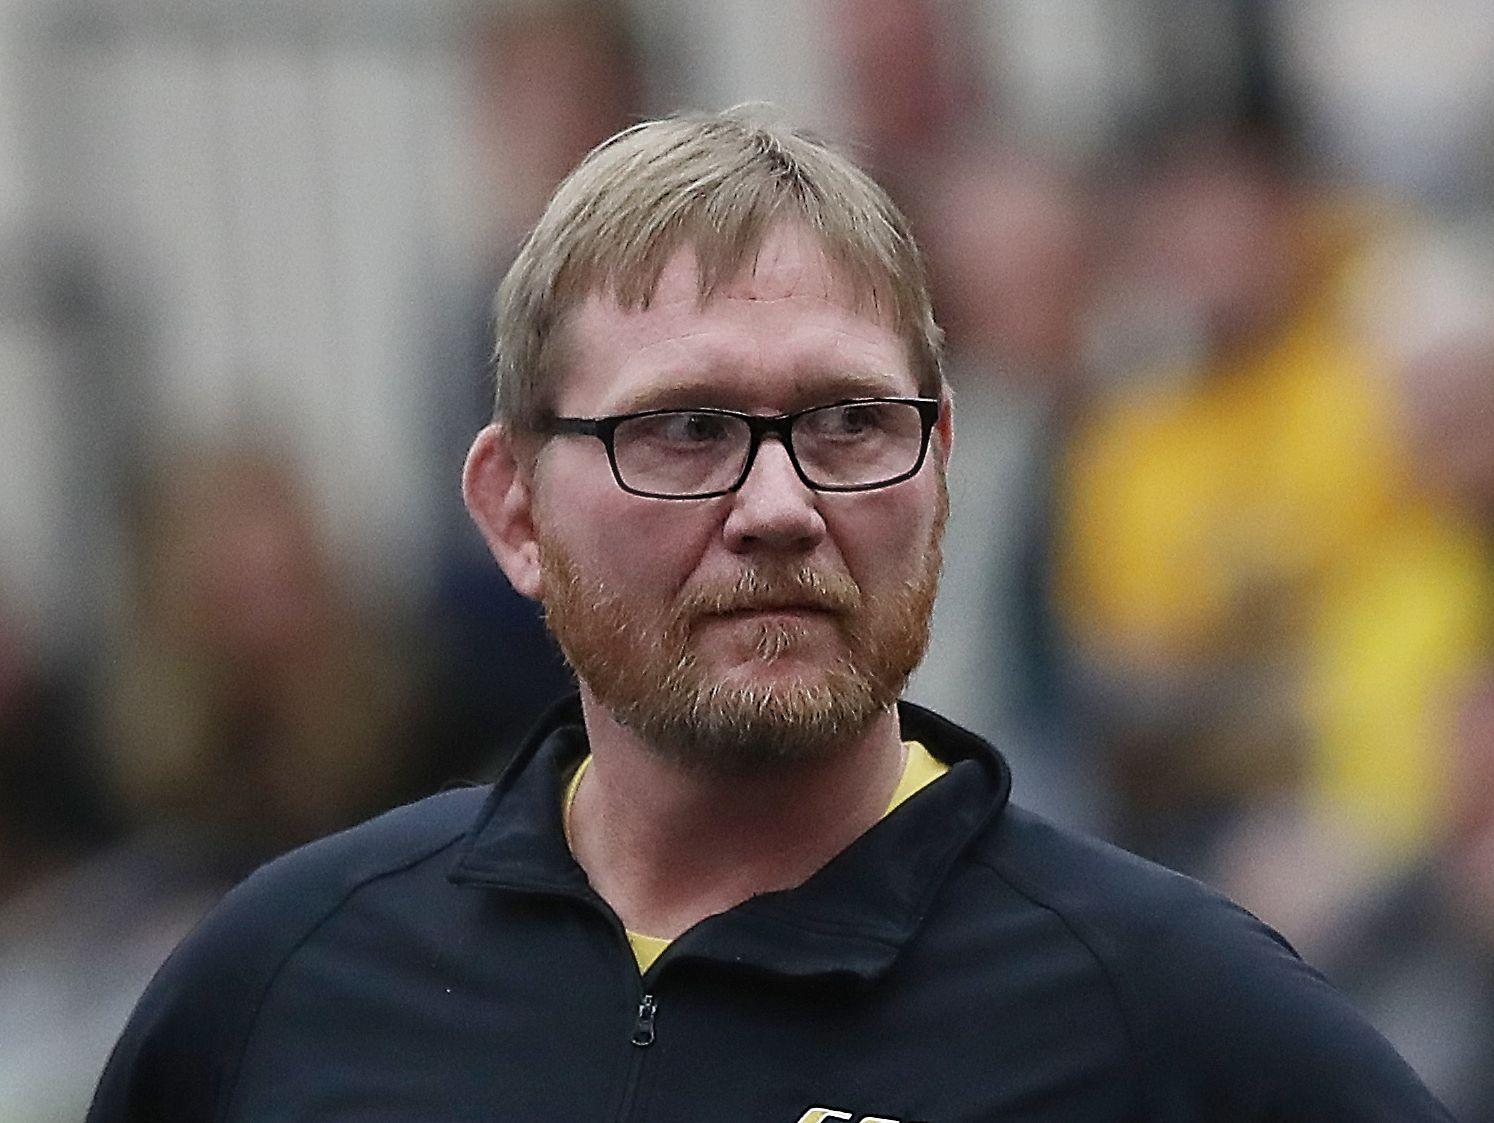 Southeast Polk Head Coach Jason Christenson watches his team during the 3A District 1 wrestling tournament at Ankeny Centennial High School.